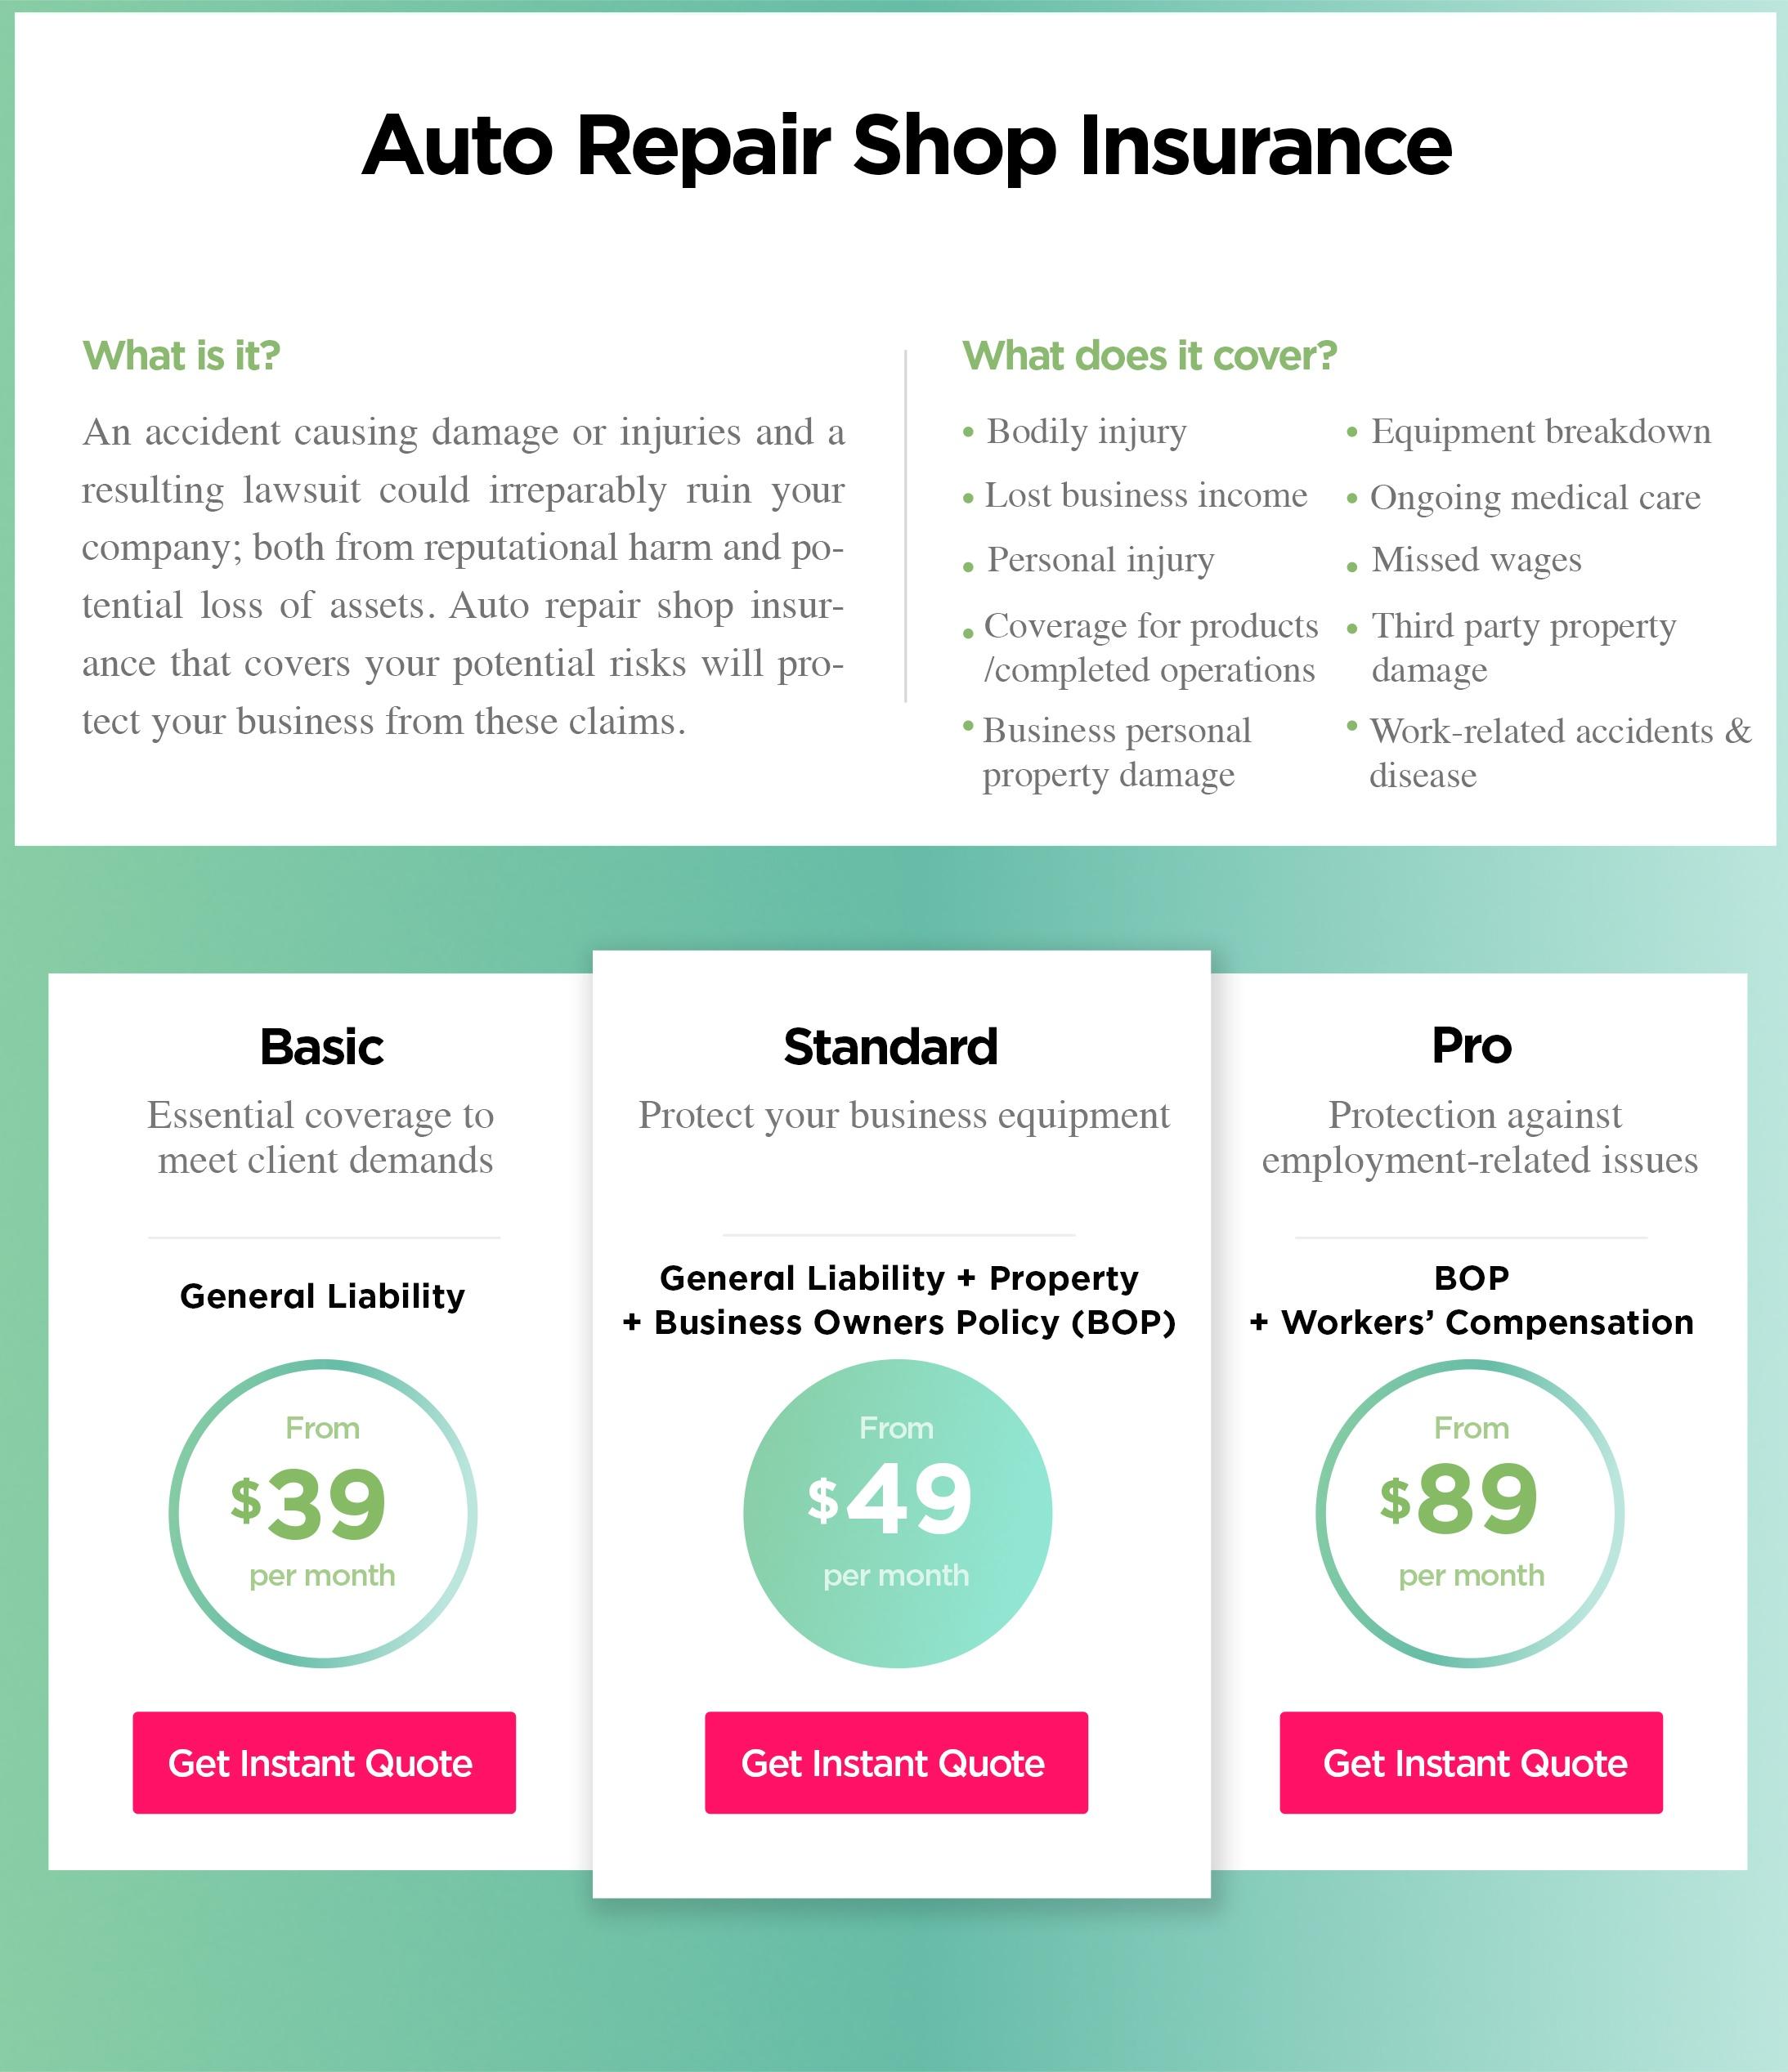 Auto repair shop insurance cost